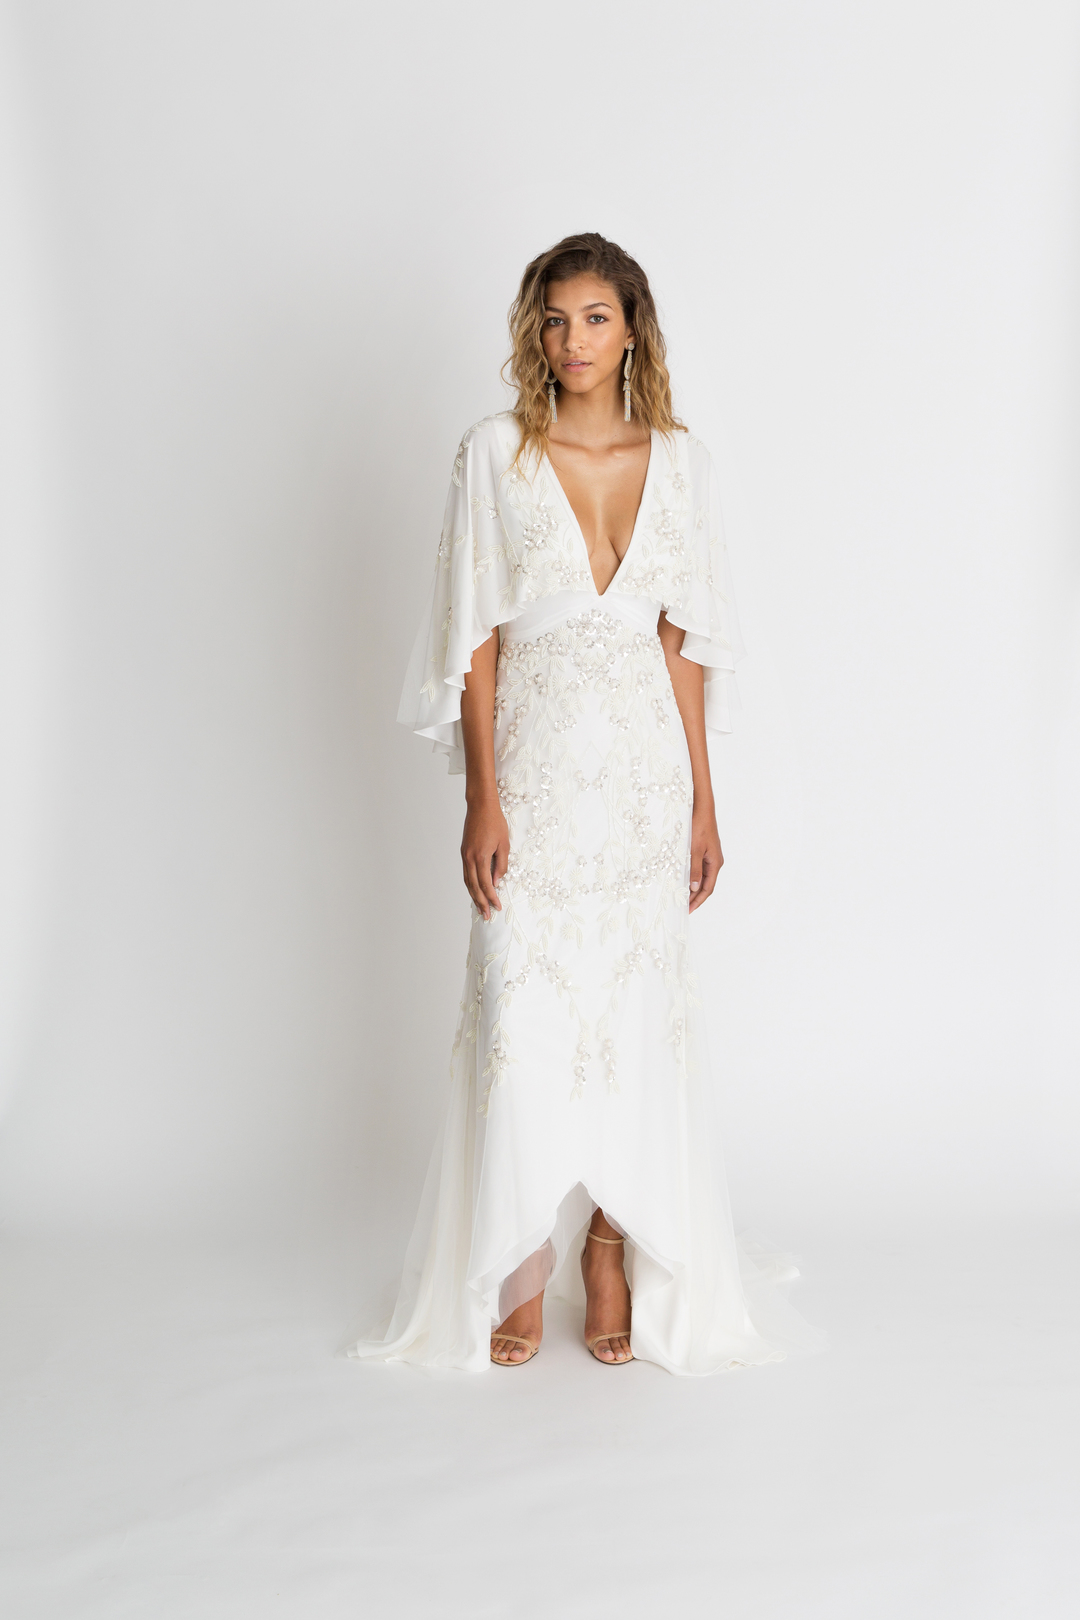 Dress main 2x 1543693403